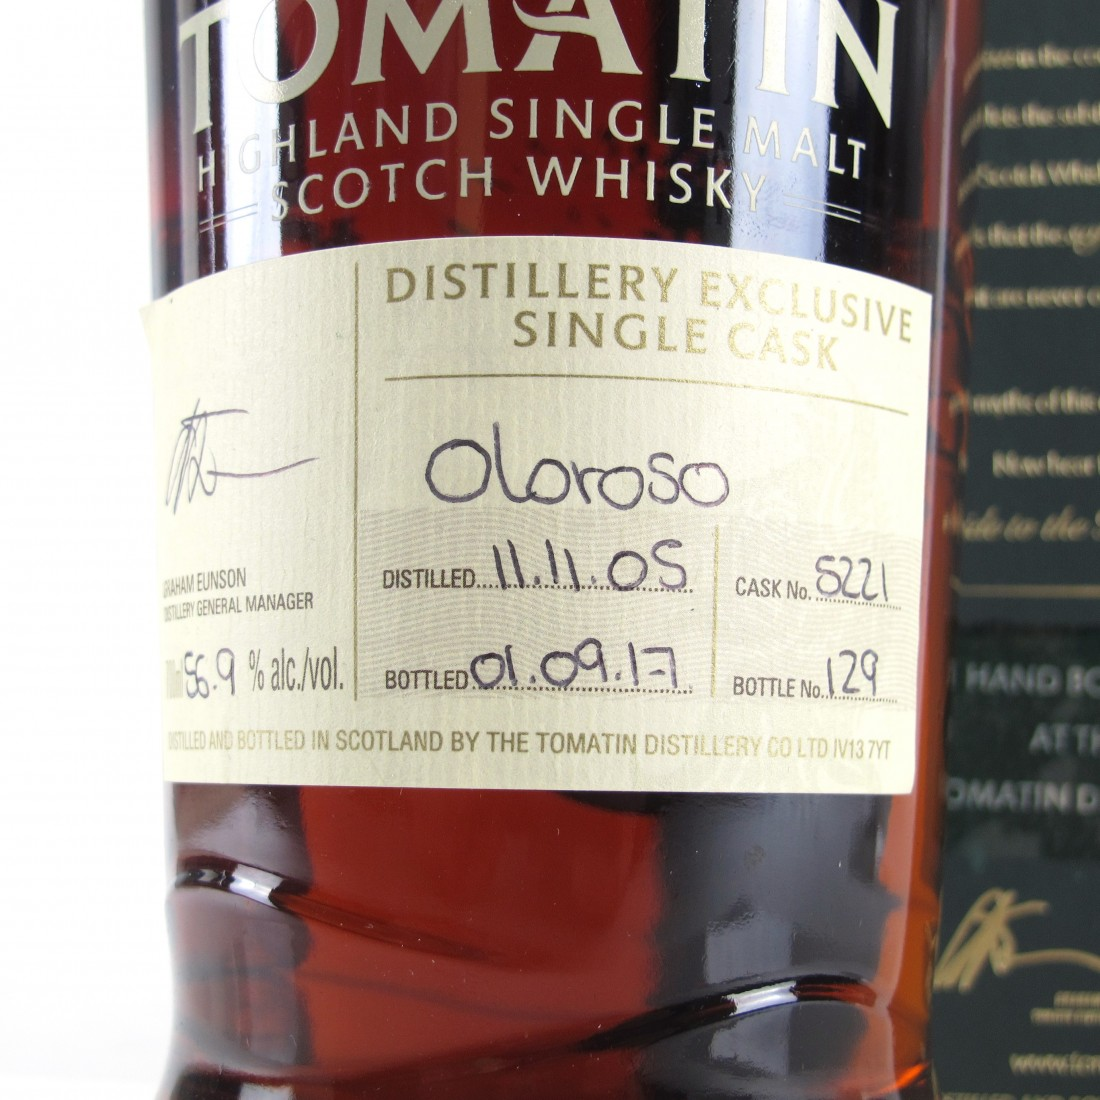 Tomatin 2005 Single Oloroso Cask Old #5221 / Distillery Exclusive